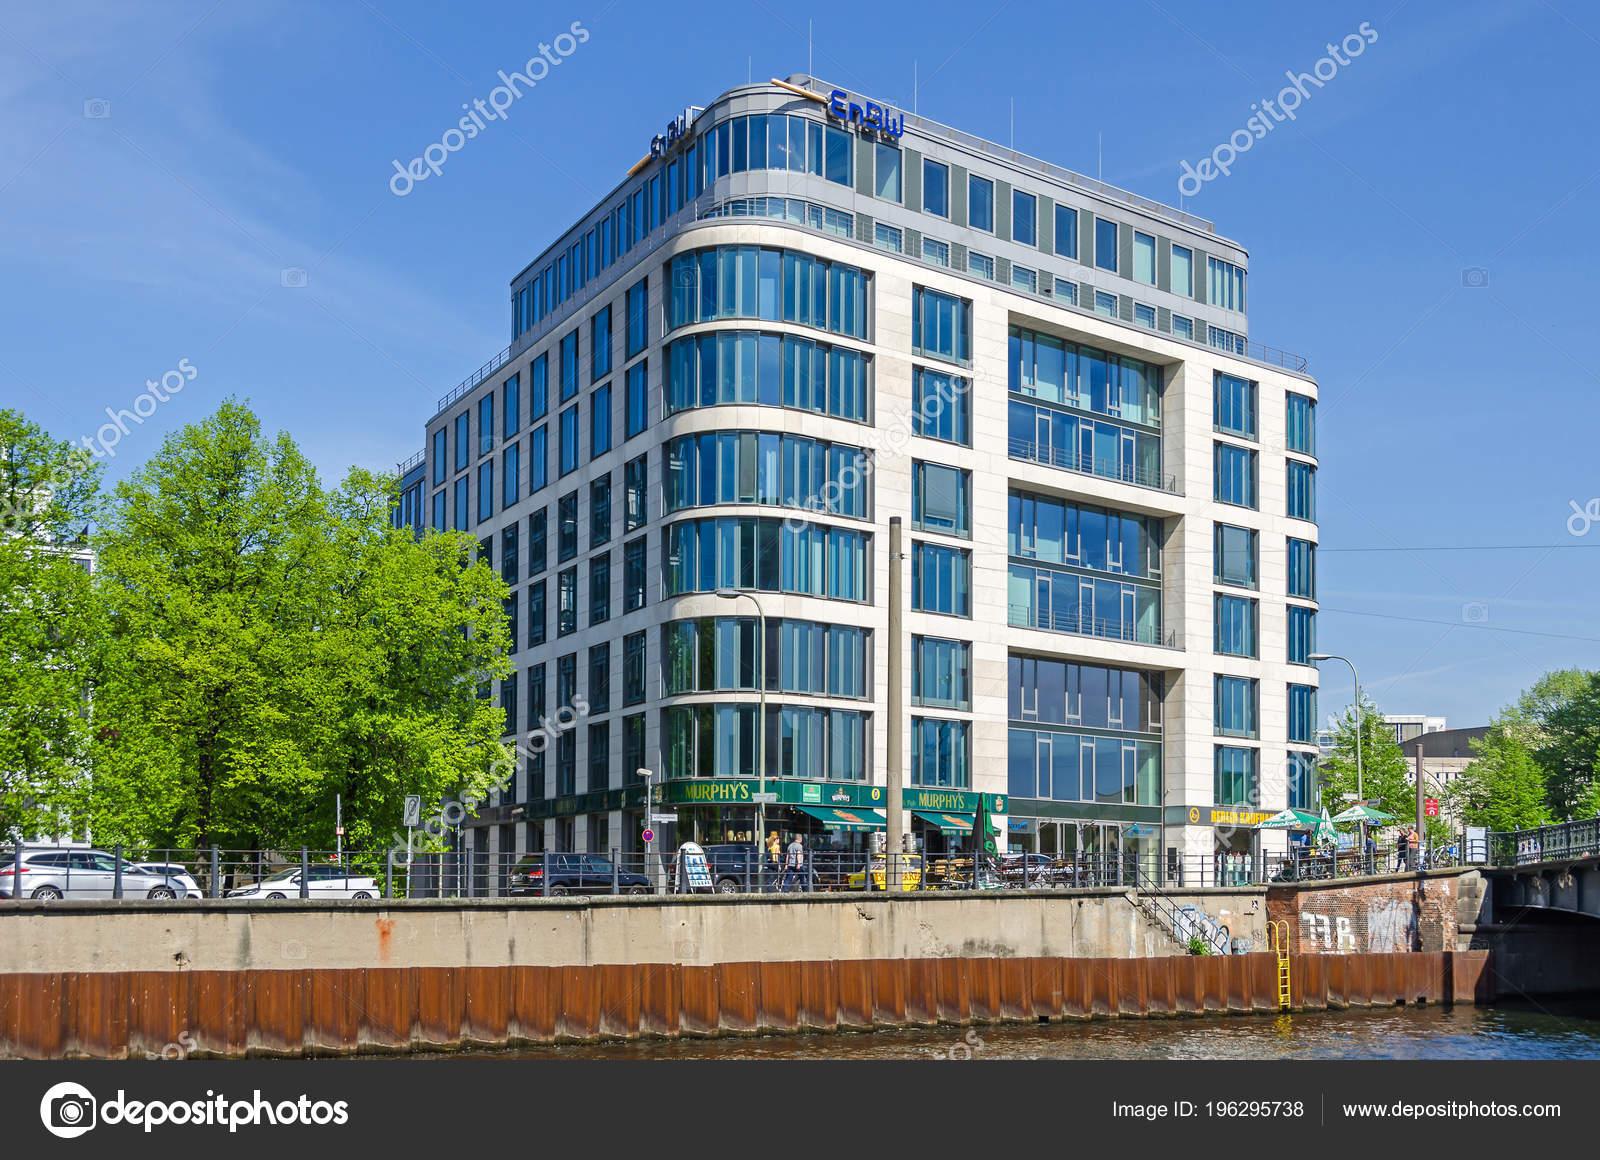 Berlin Germany April 2018 River Spree Its Bank